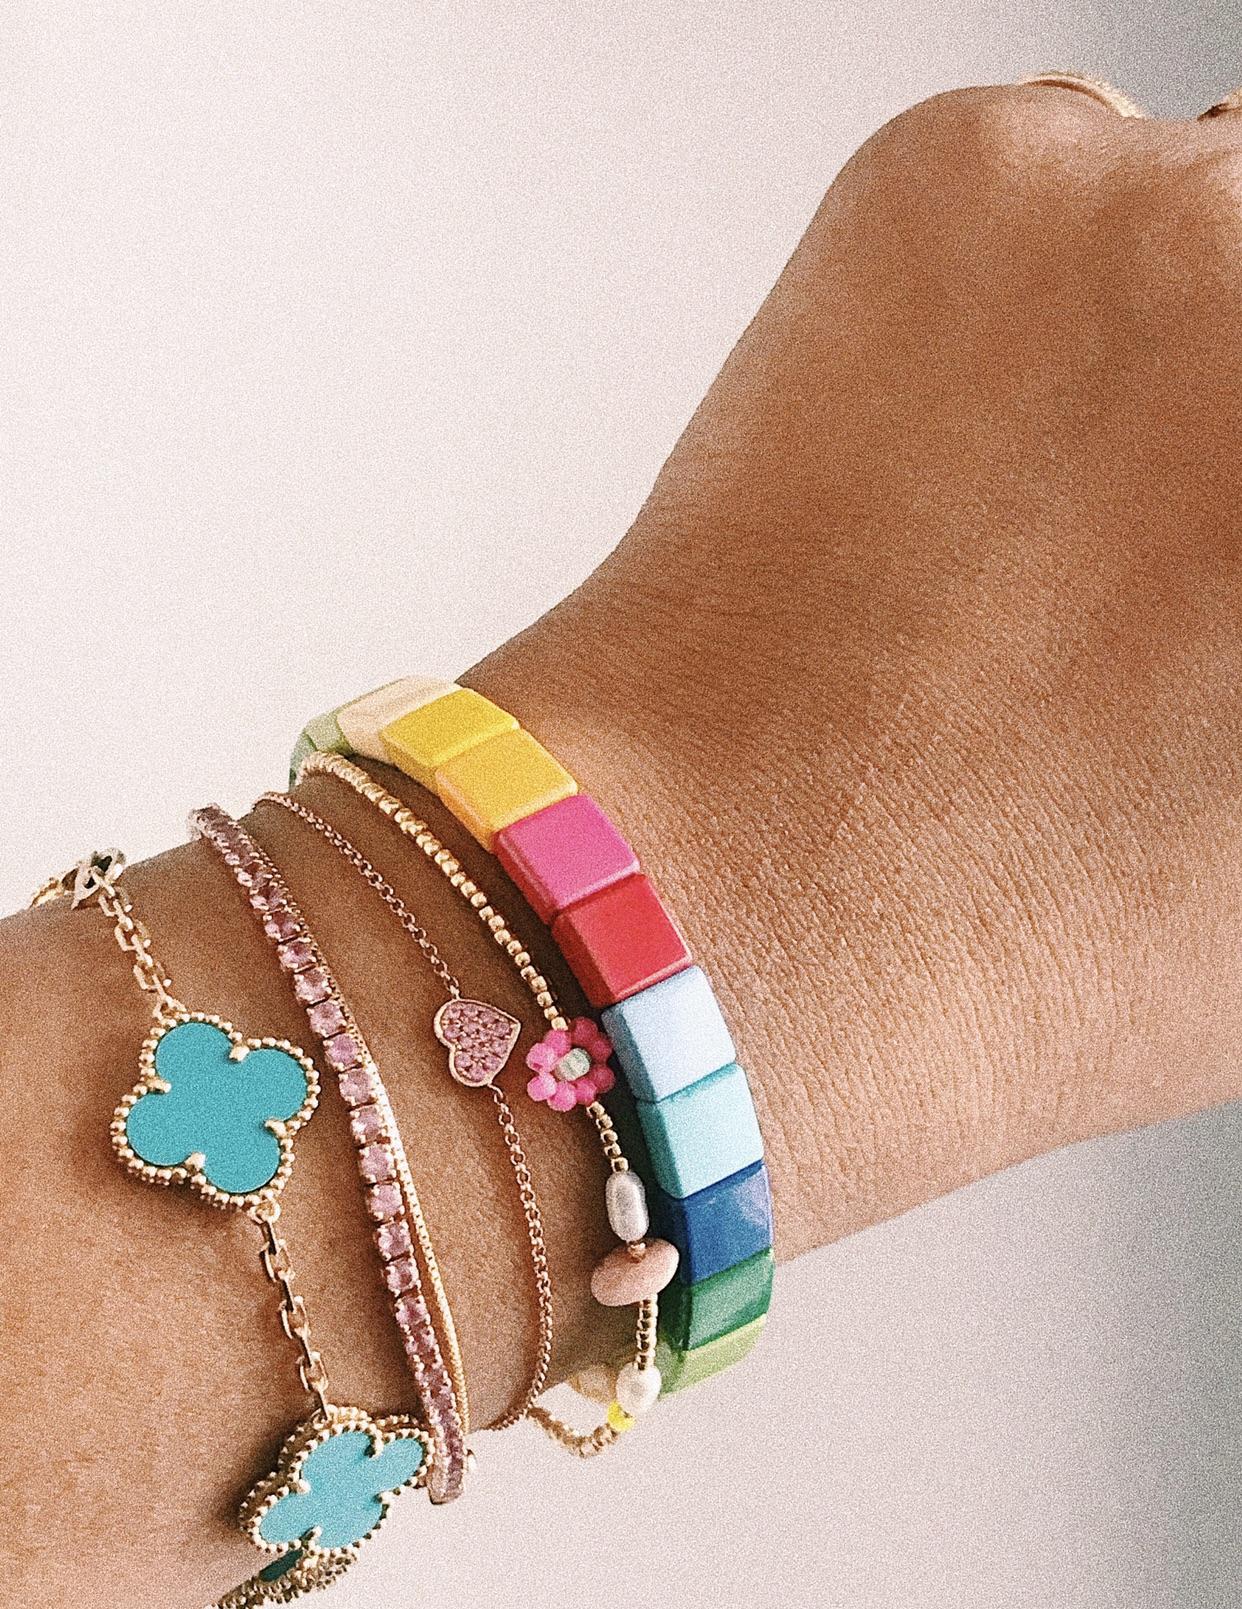 Best Bracelet Brands